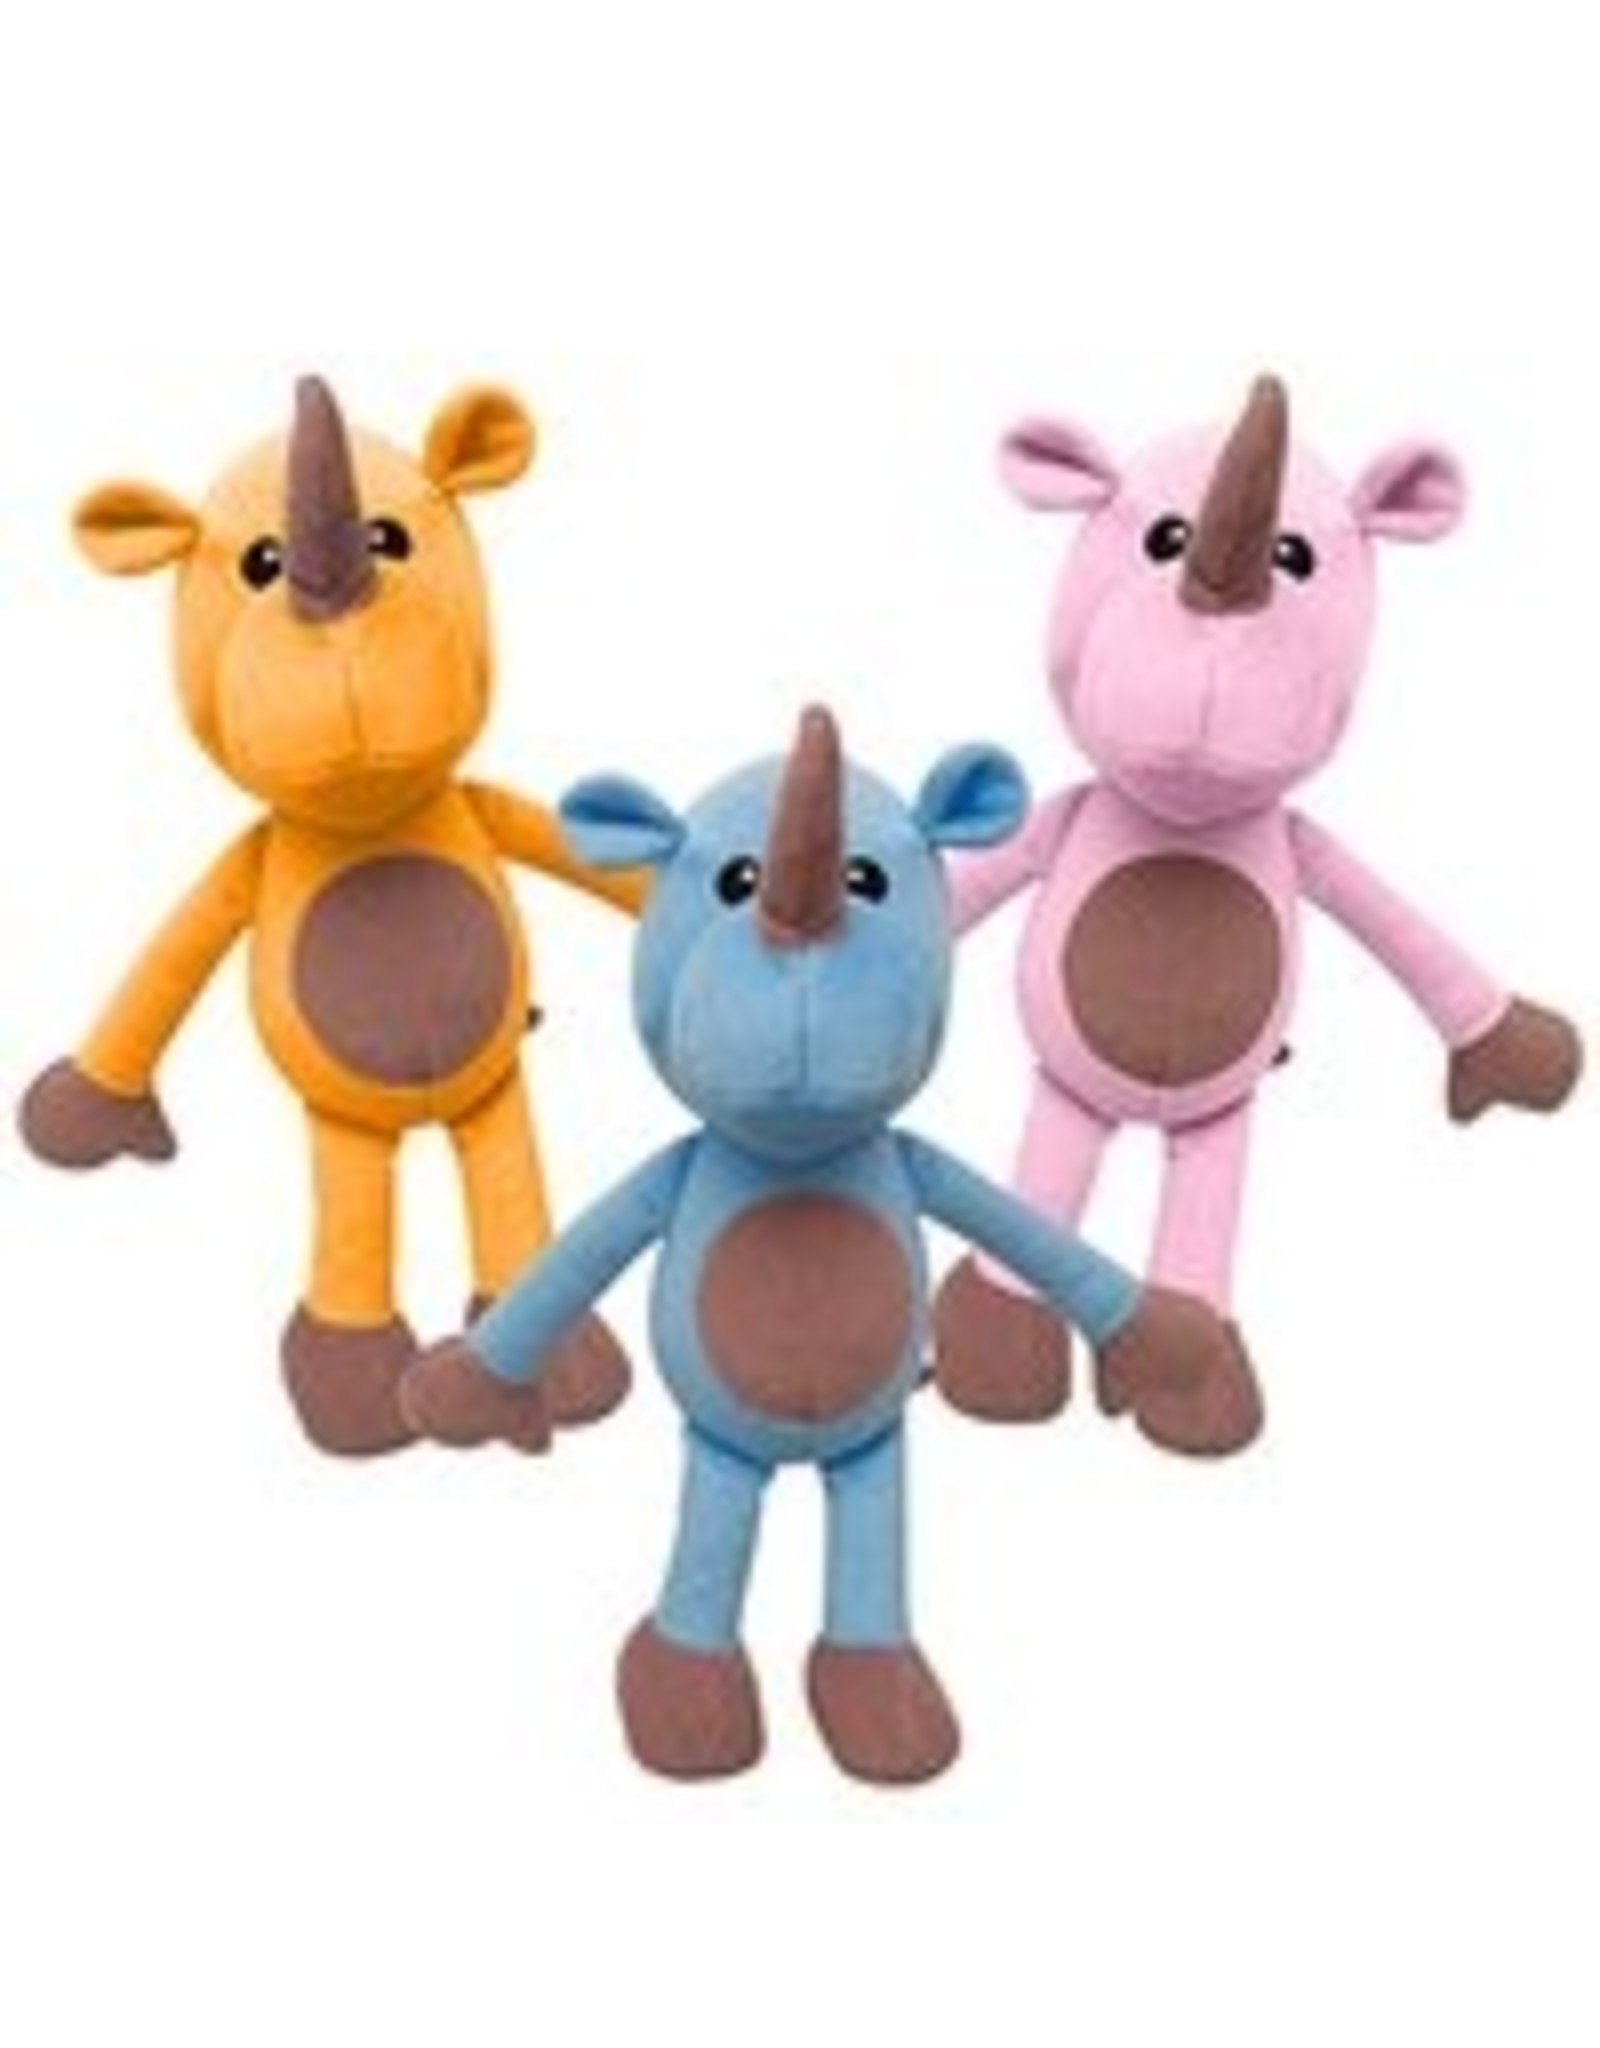 "SNUGGAROOZ SNUGAROOZ Robbie the Rhino Assorted Colors Plush Dog Toy 14"""